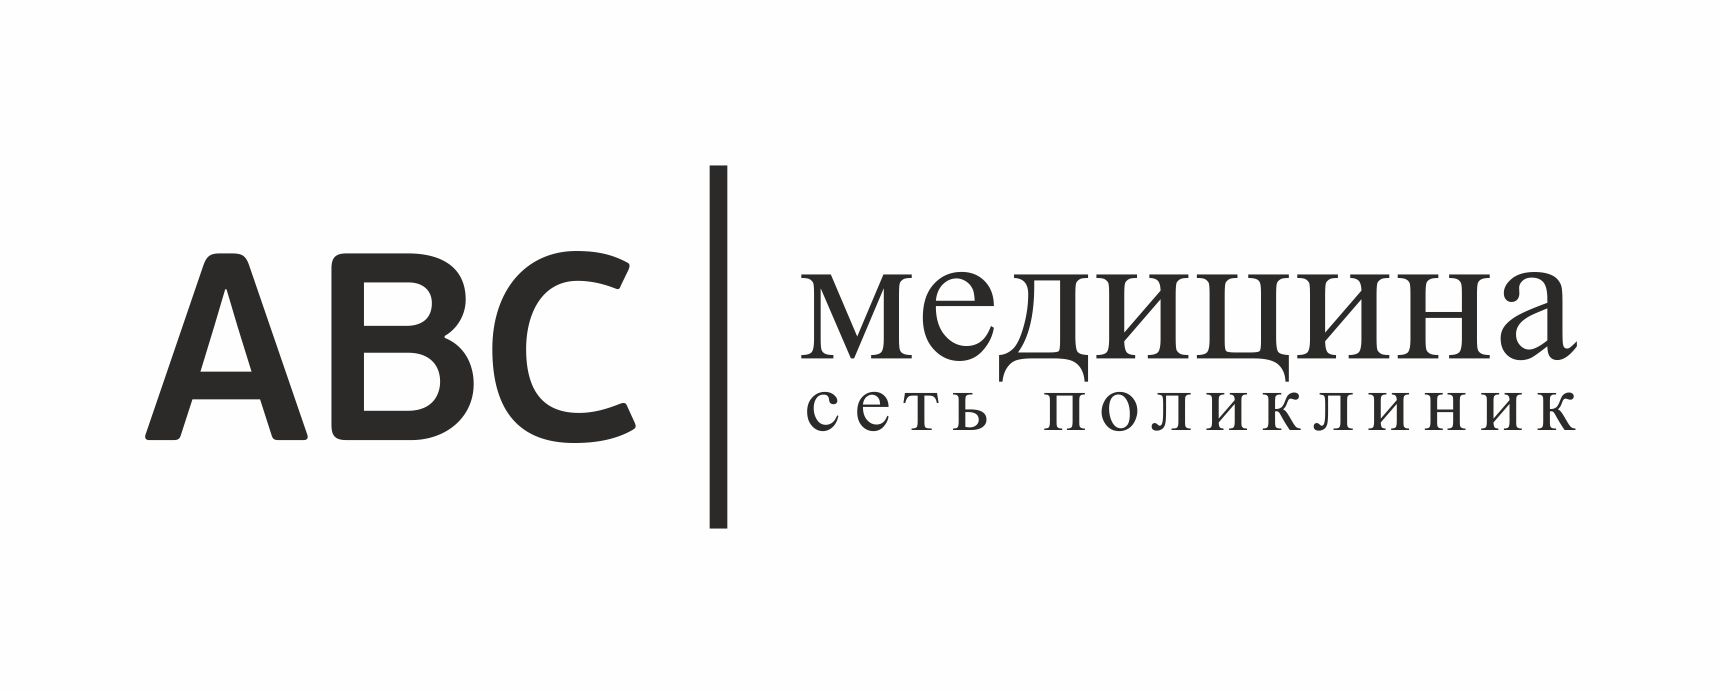 Семейная поликлиника «ABC медицина» у м. Ясенево